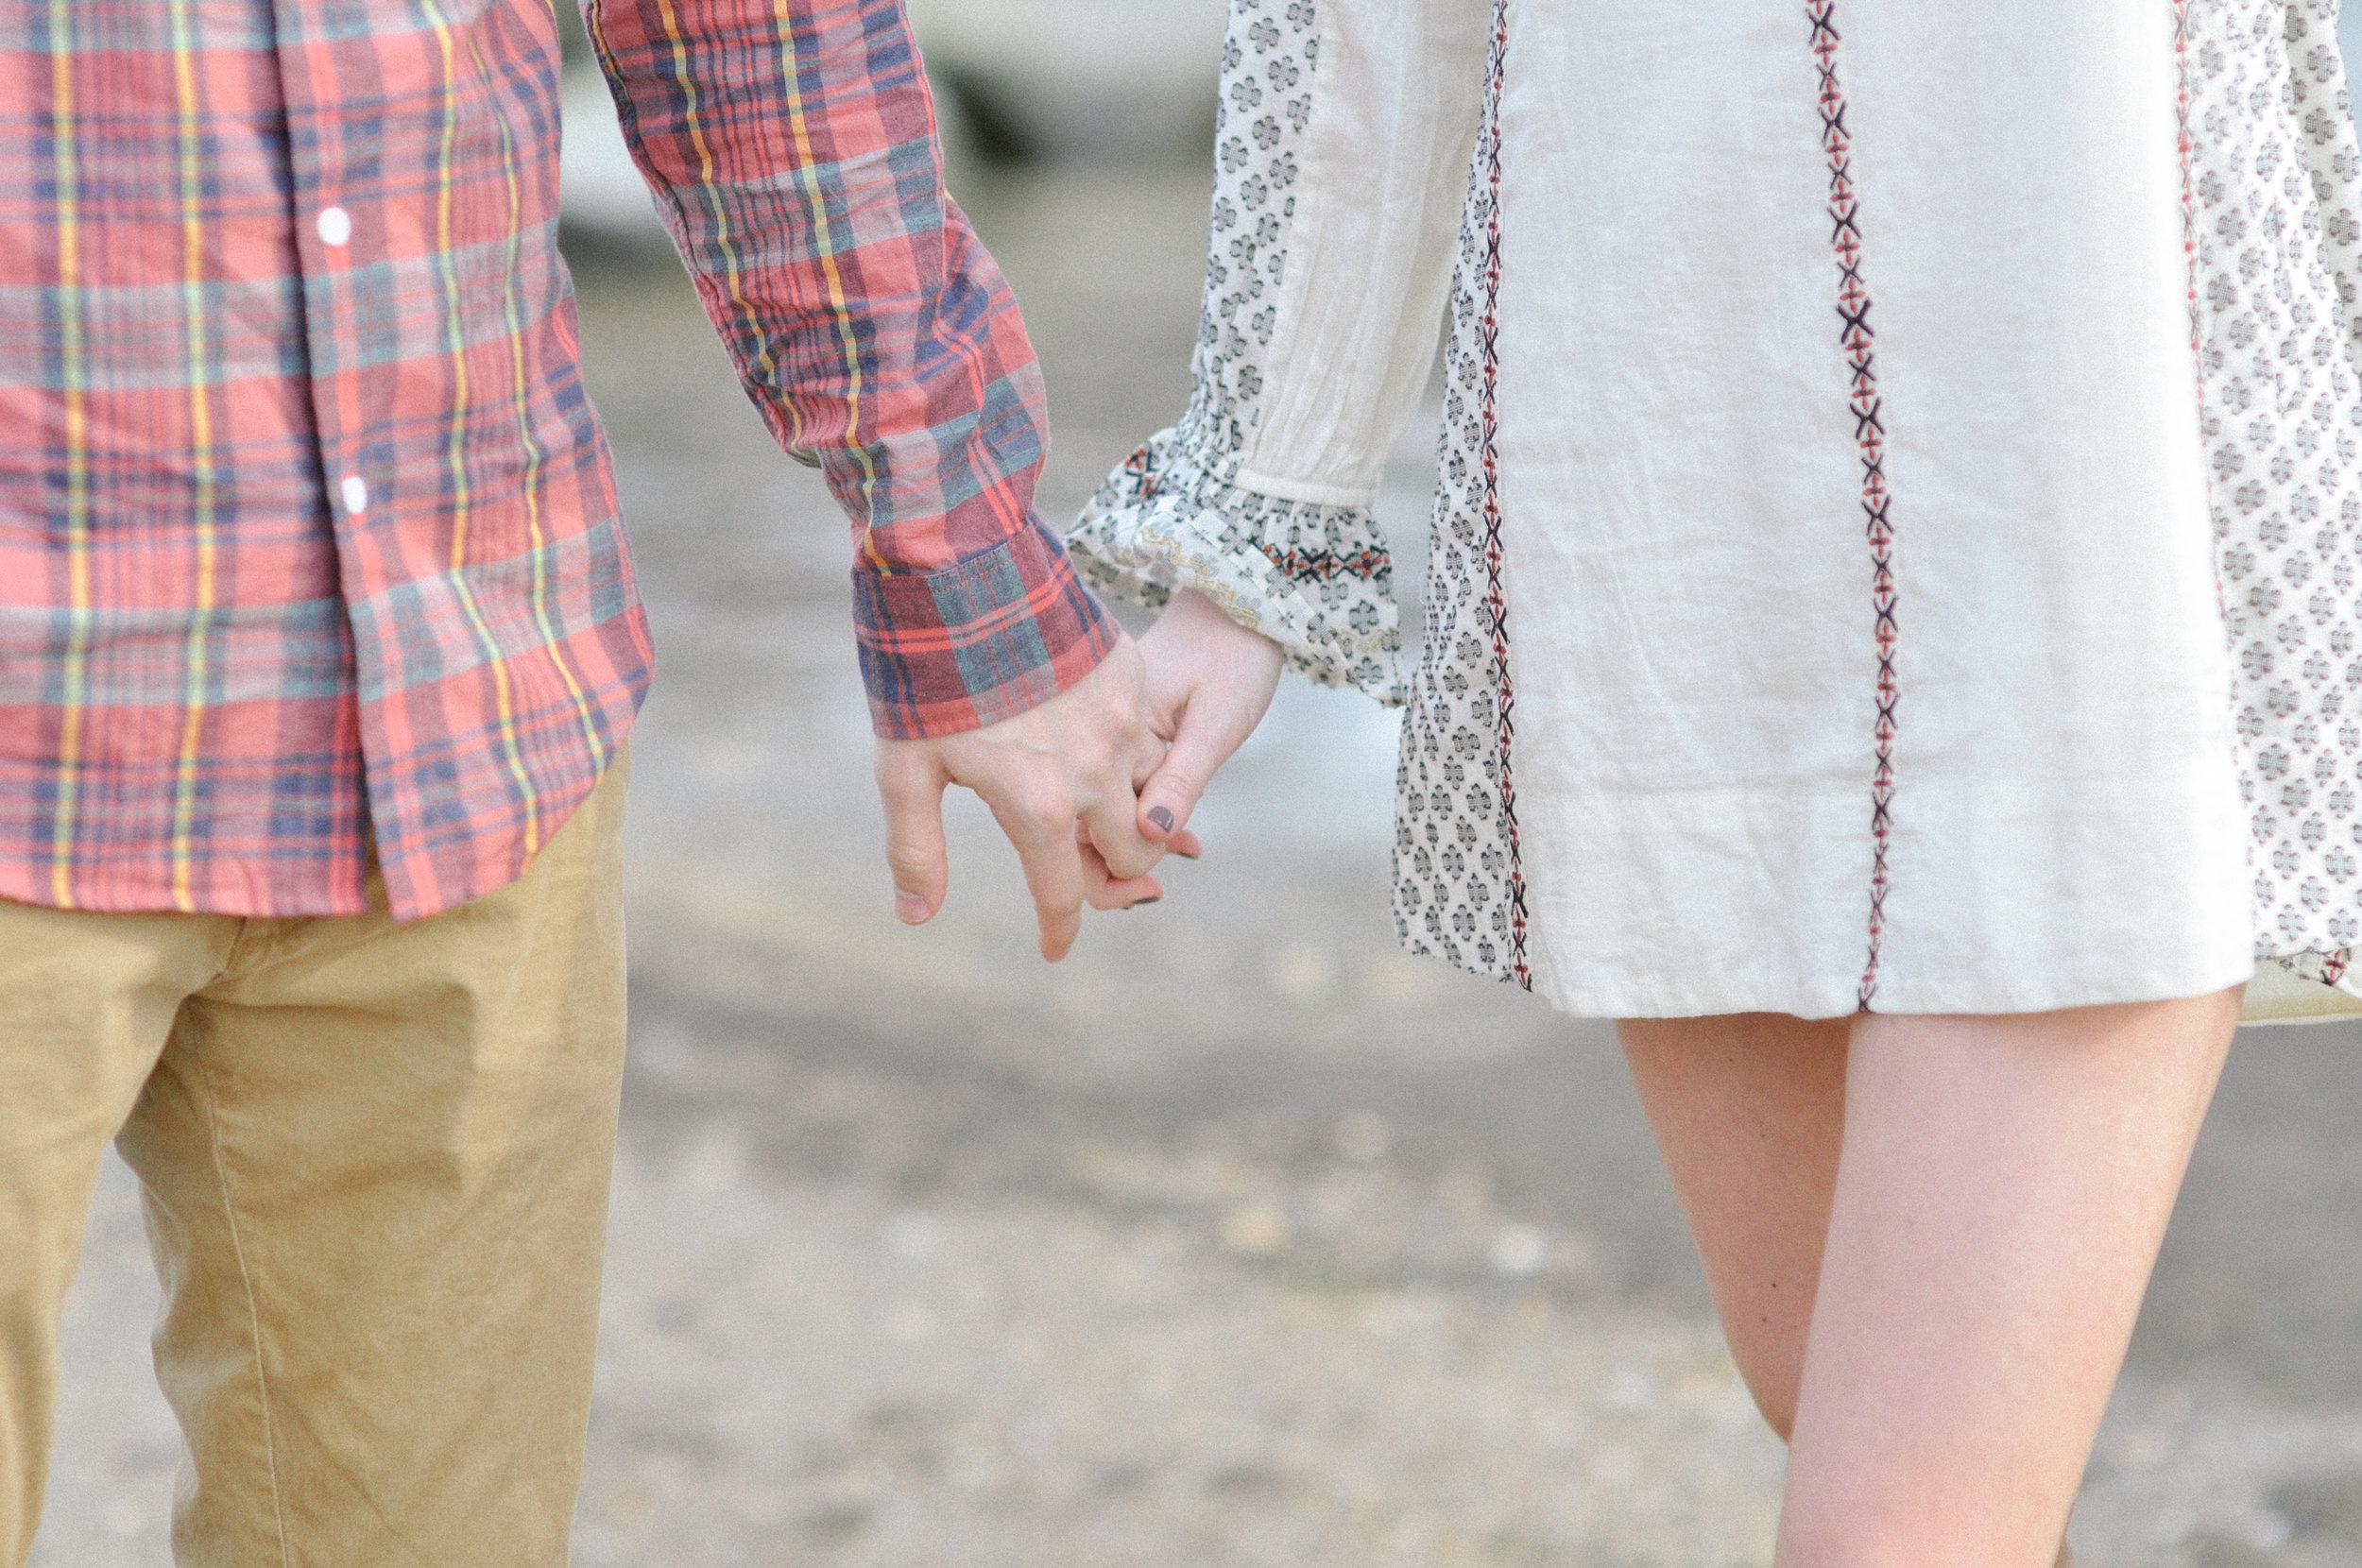 engagement-session-north-beach-chesapeake-beach hands in love.jpg